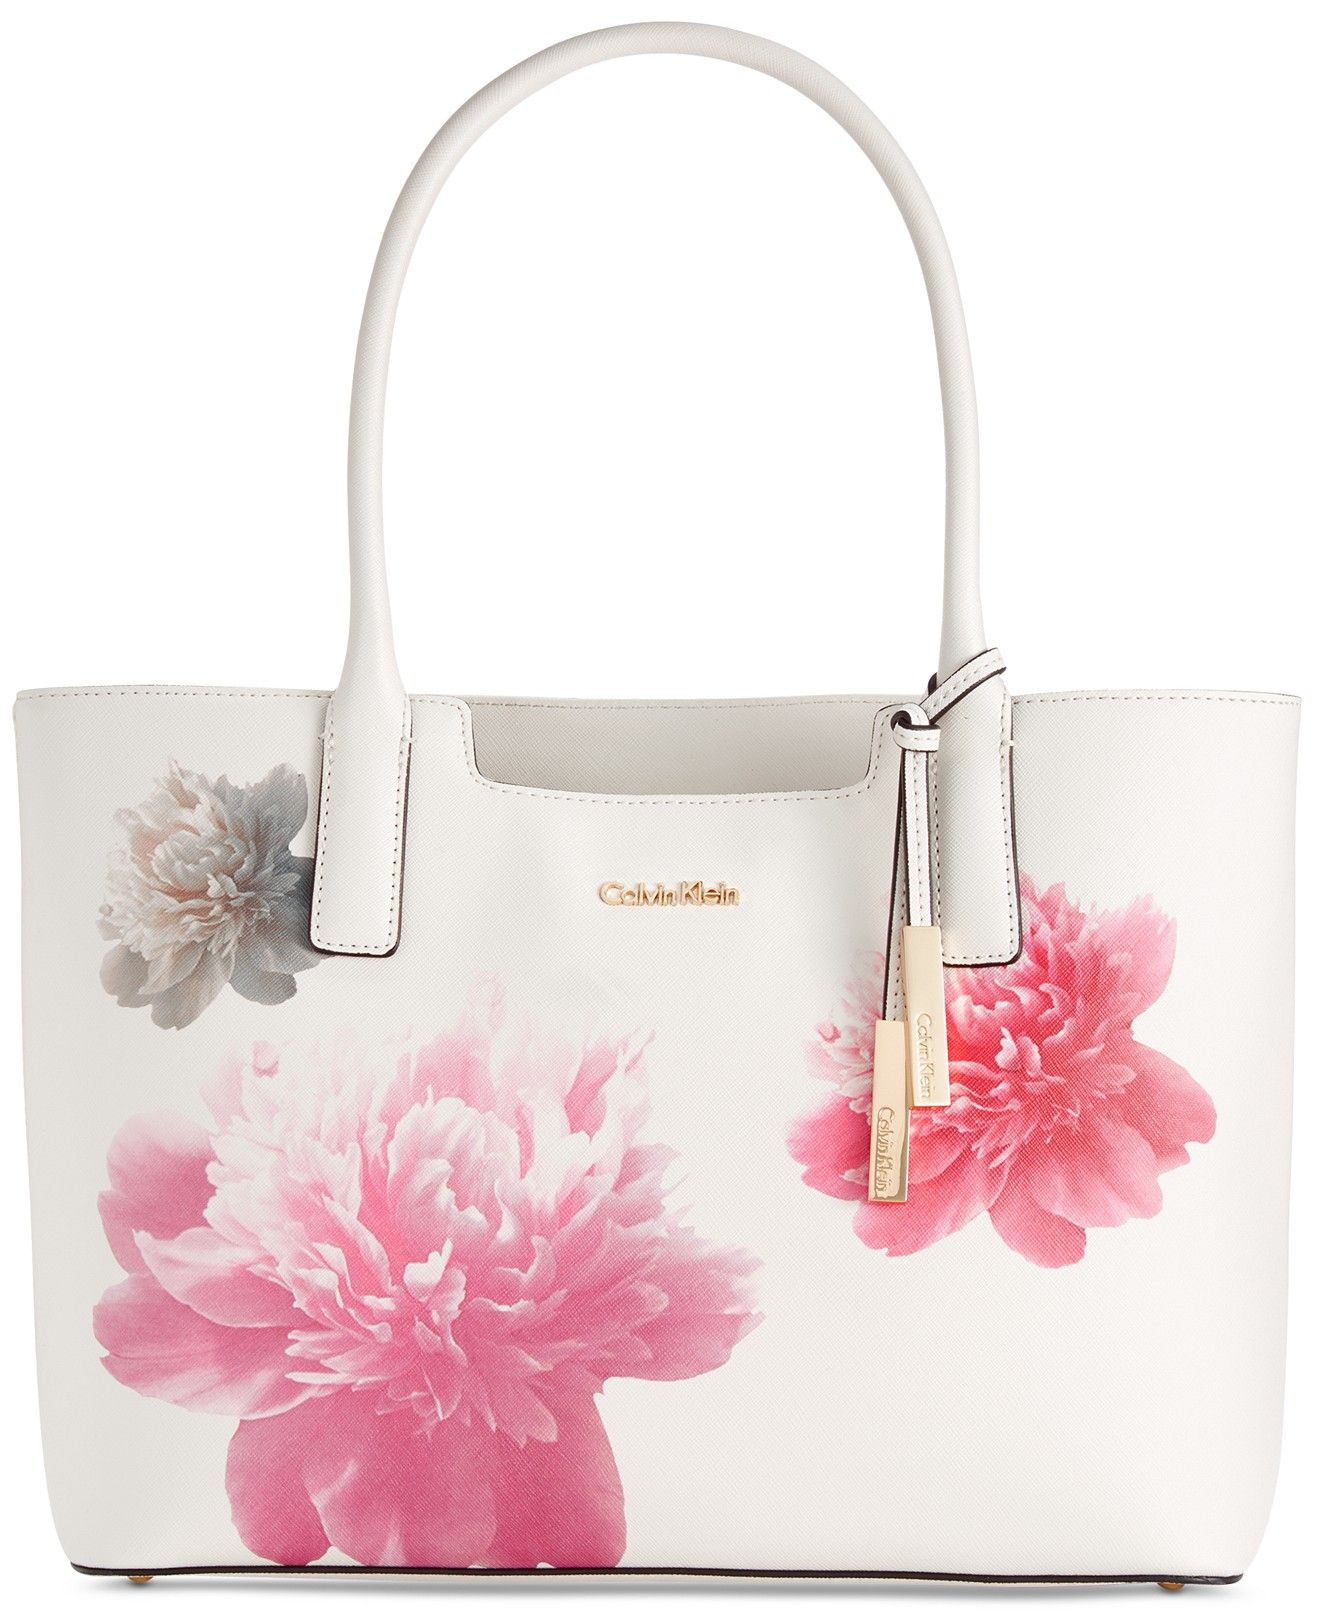 4c84a1604b Calvin Klein Peony Saffiano Tote - Calvin Klein - Handbags & Accessories -  Macy's